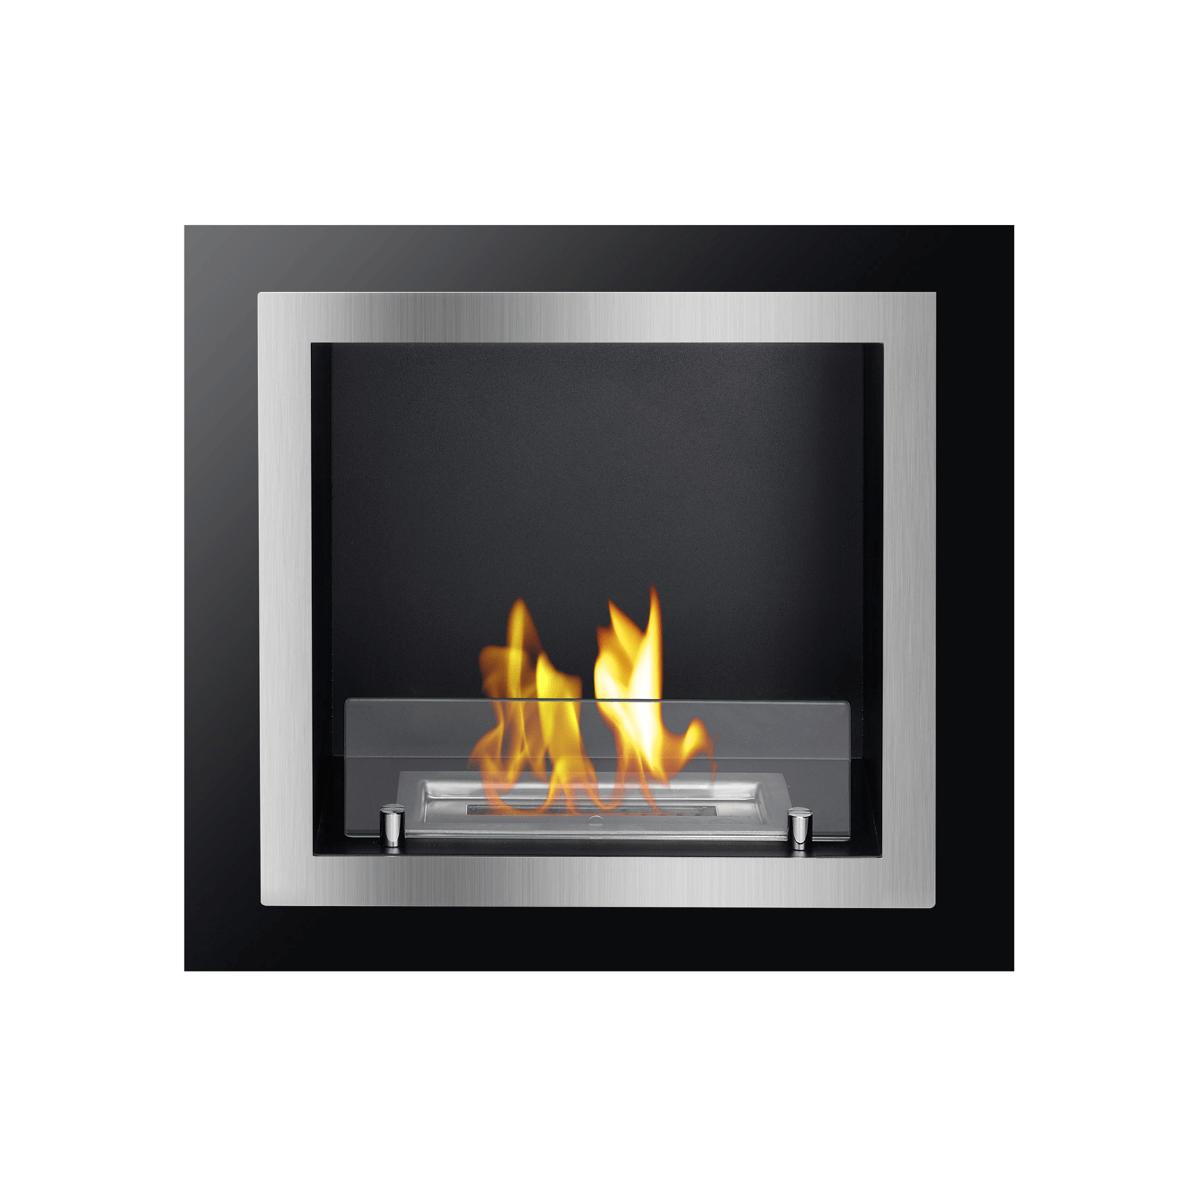 Ignis Ethanol Fireplace Bioethanol Fireplace Mounted Fireplace